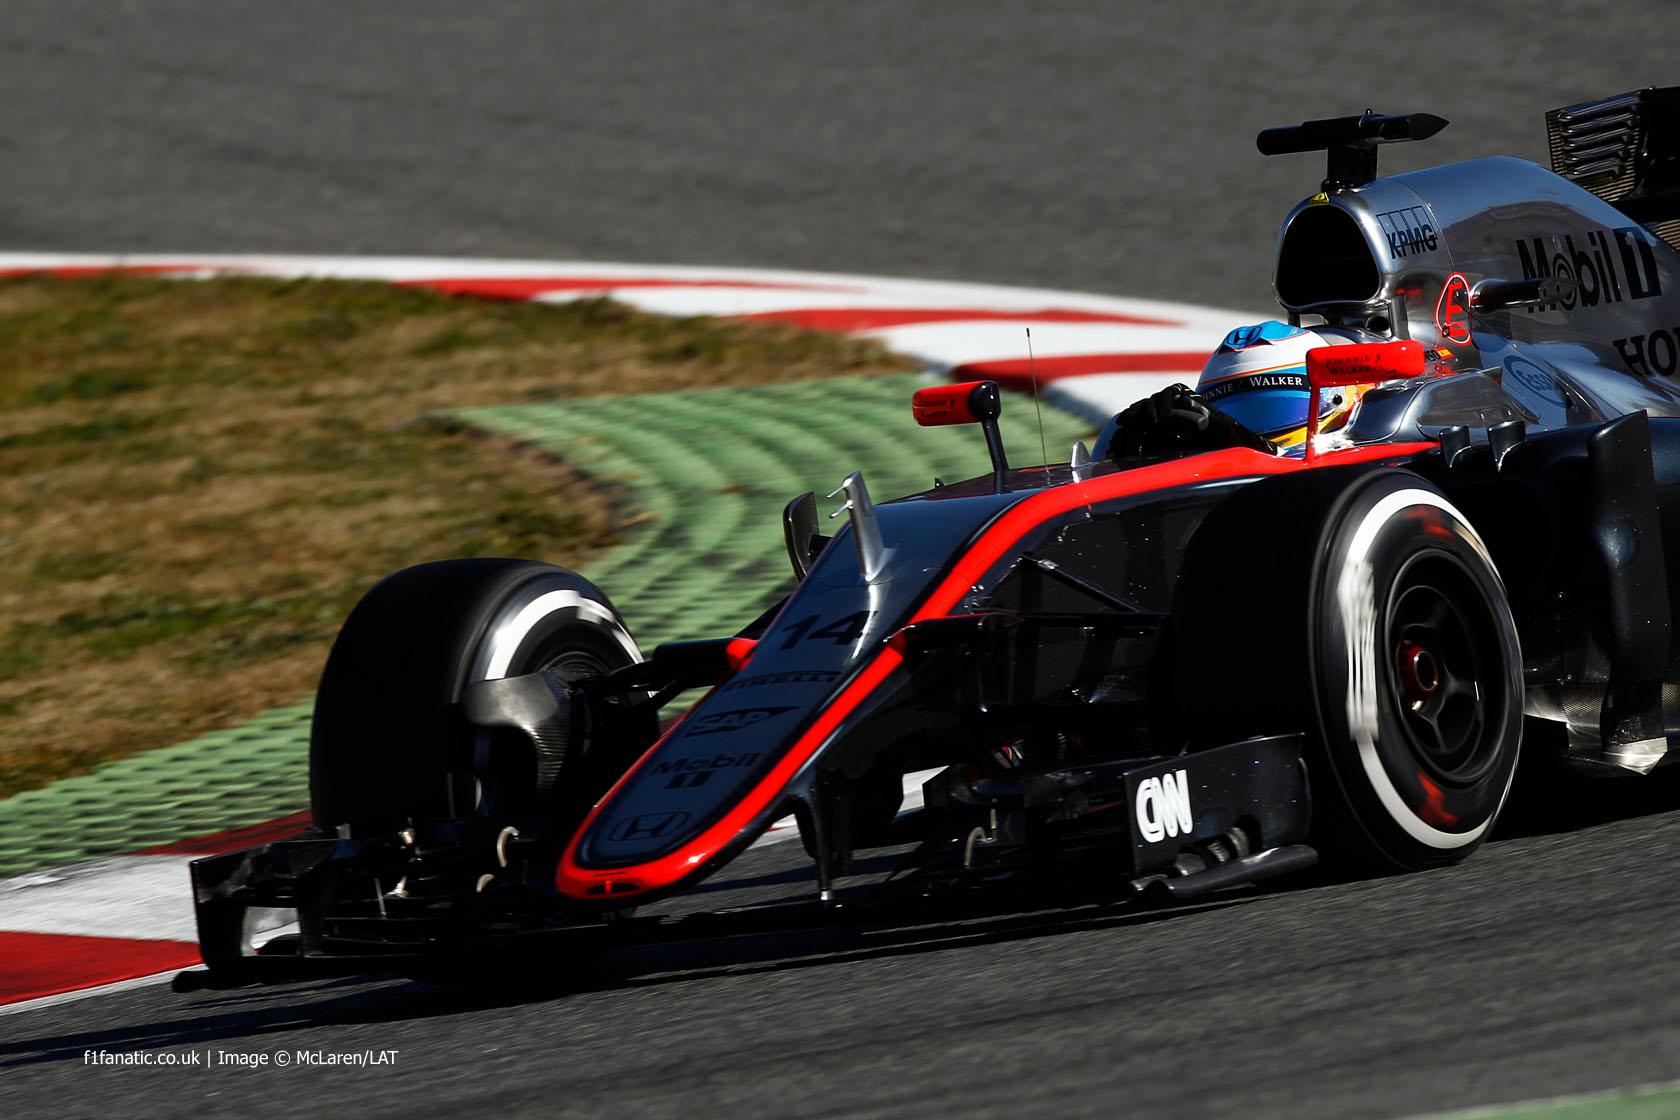 Fernando Alonso, McLaren, Circuit de Catalunya, 2015